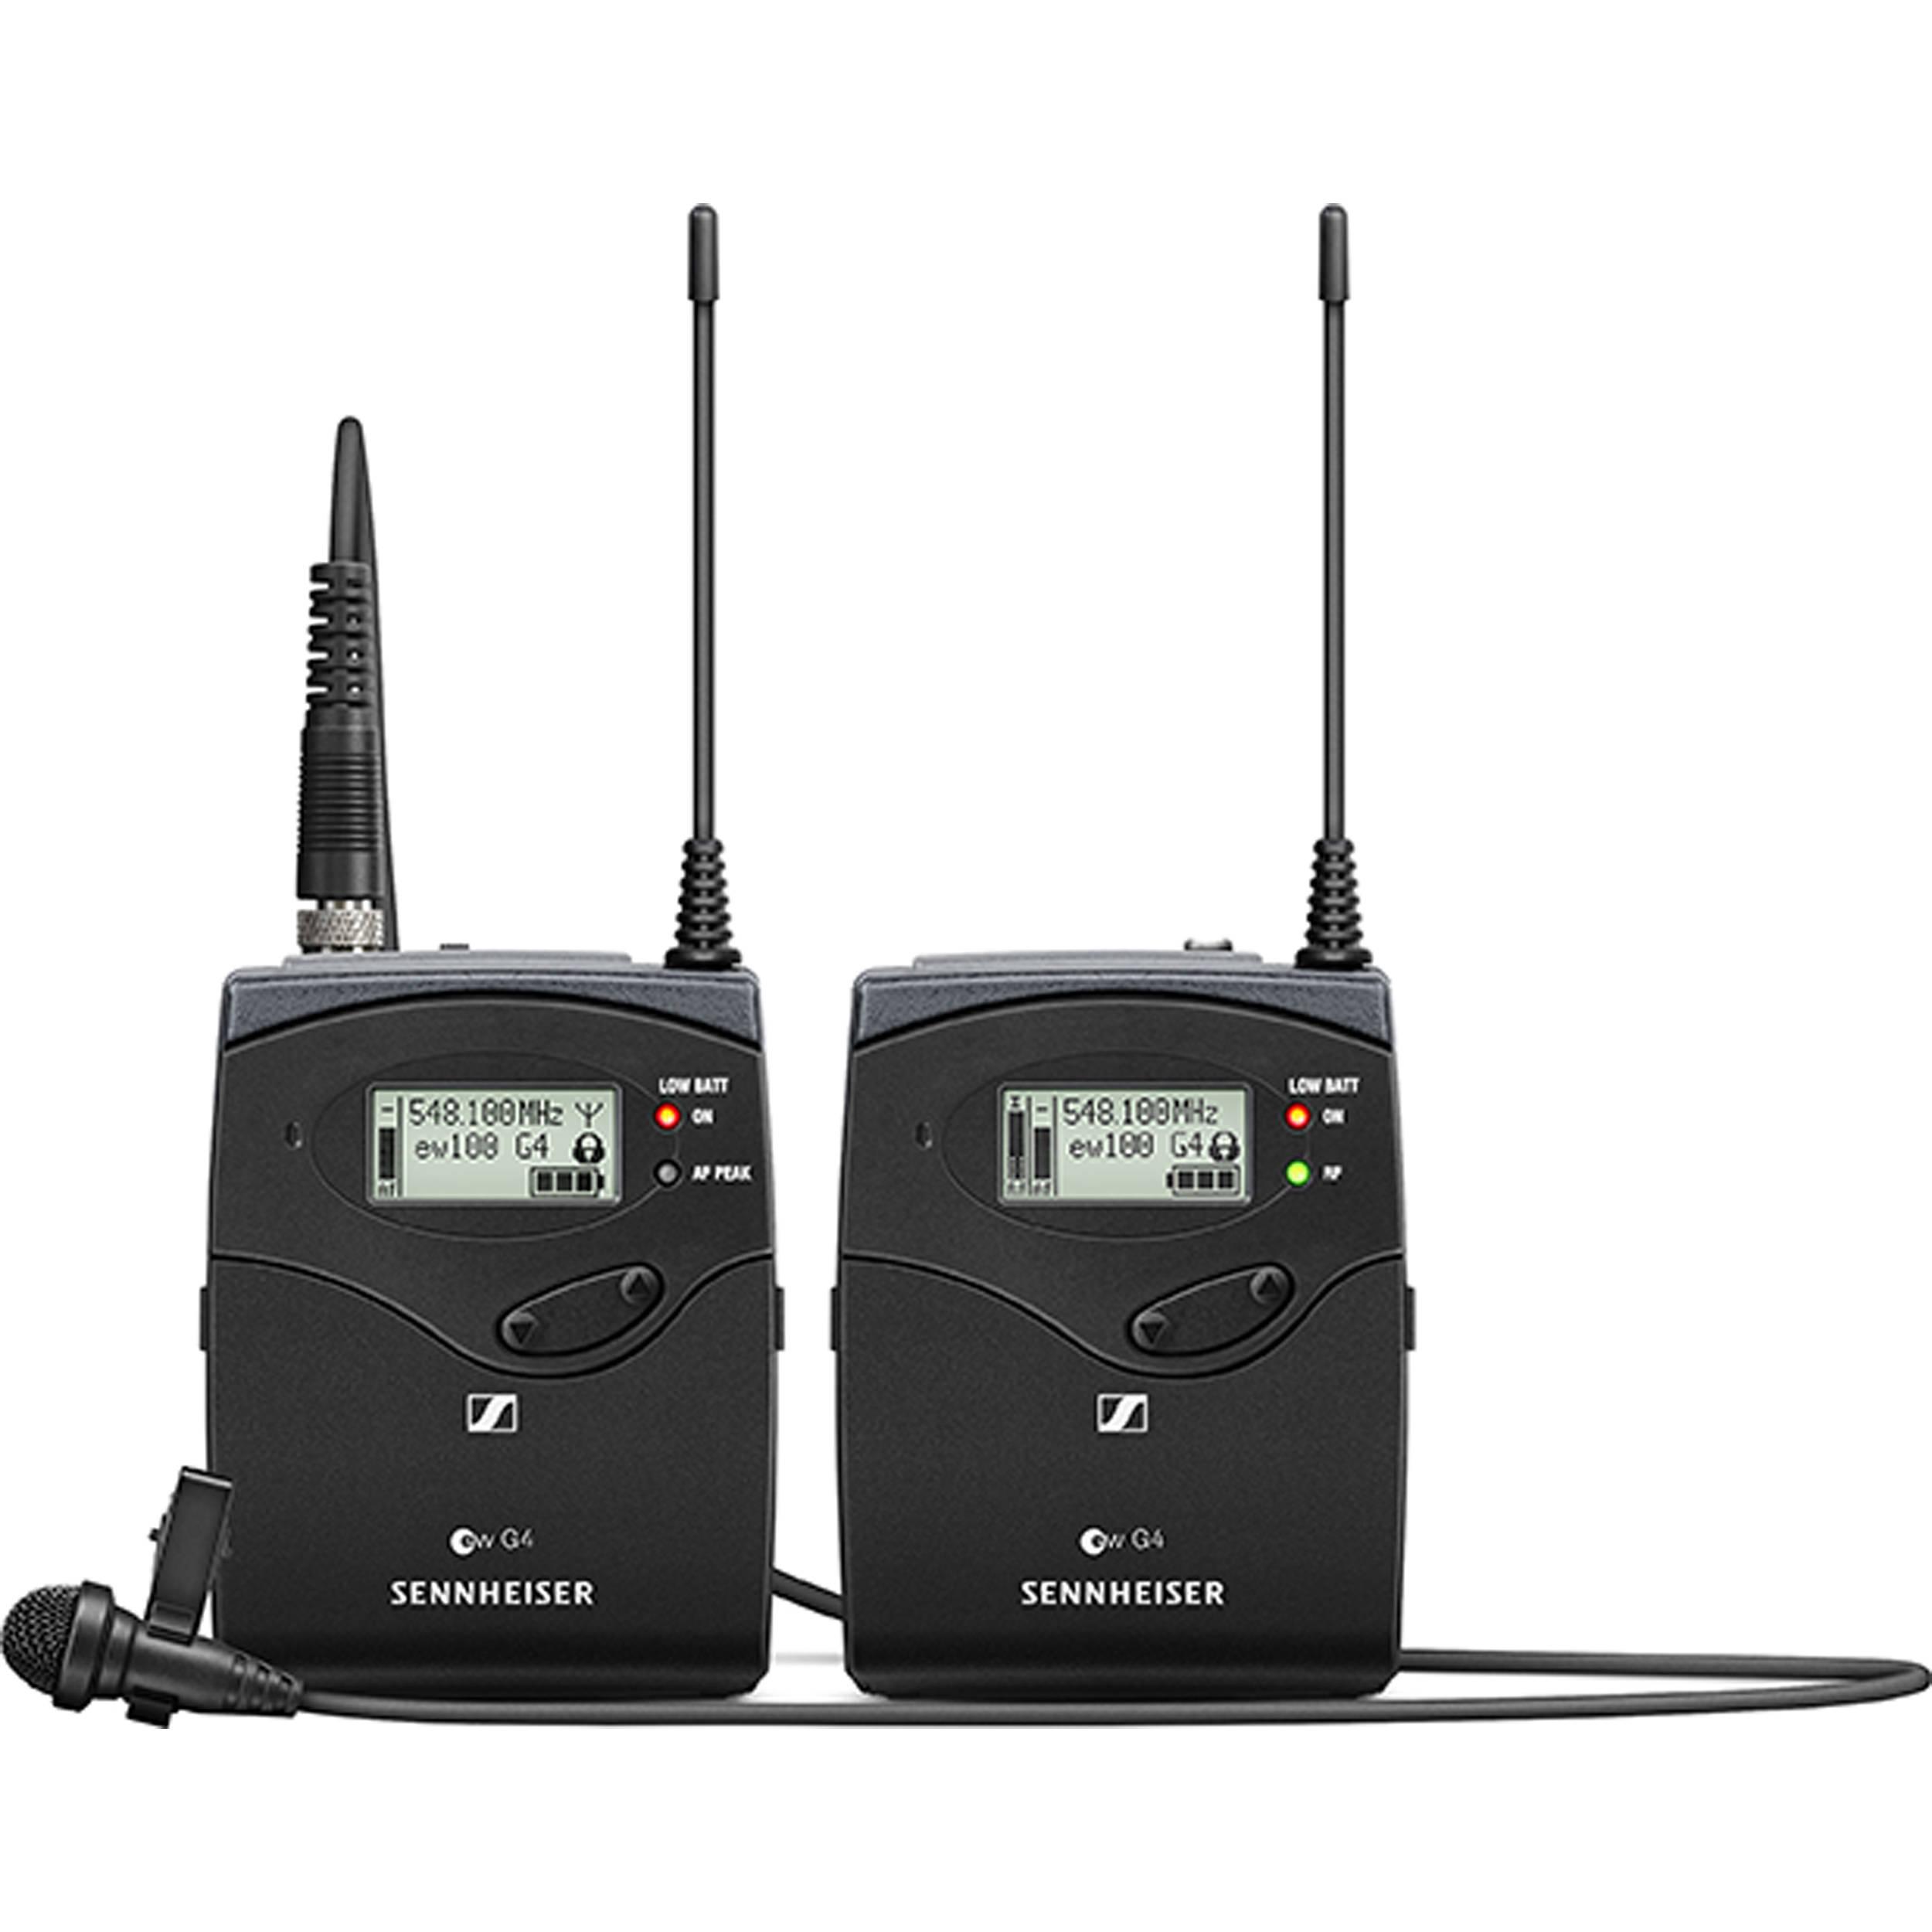 [RENT] Sennheiser EW 112P G4 – A Omni-directional Wireless Lavalier Microphone System